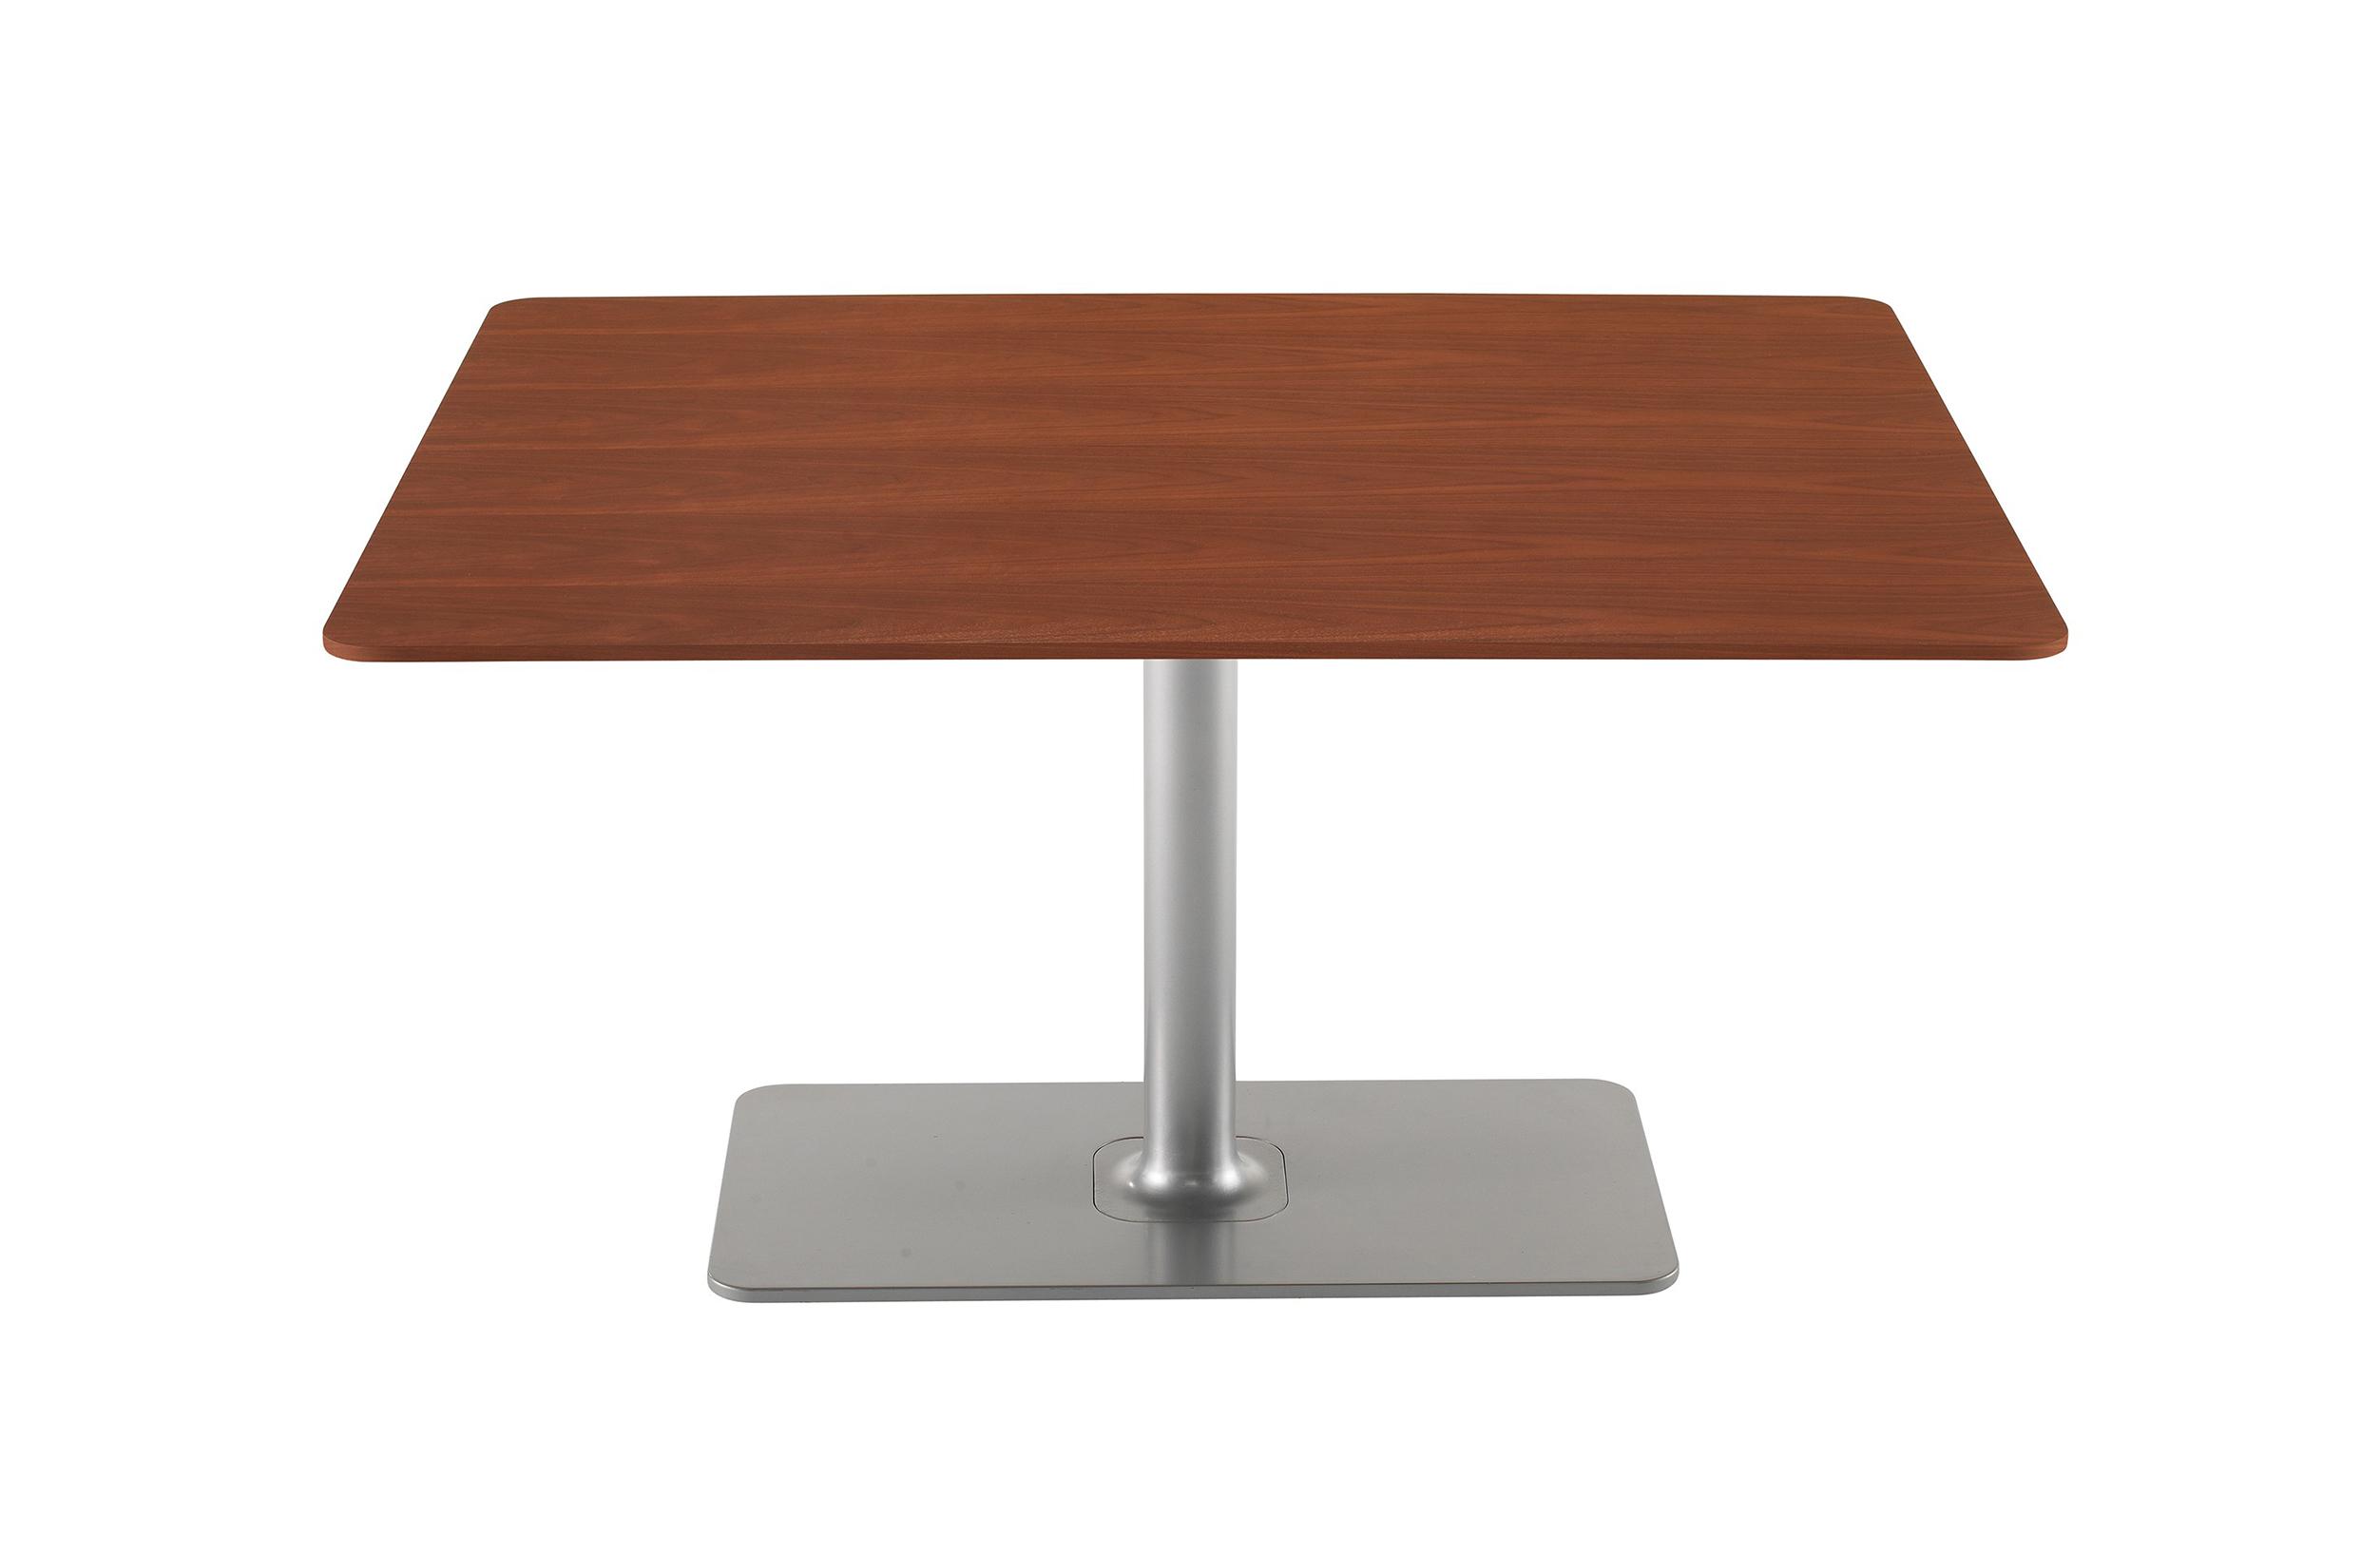 coalesse-lagunitas-work_and_occasional_tables-03